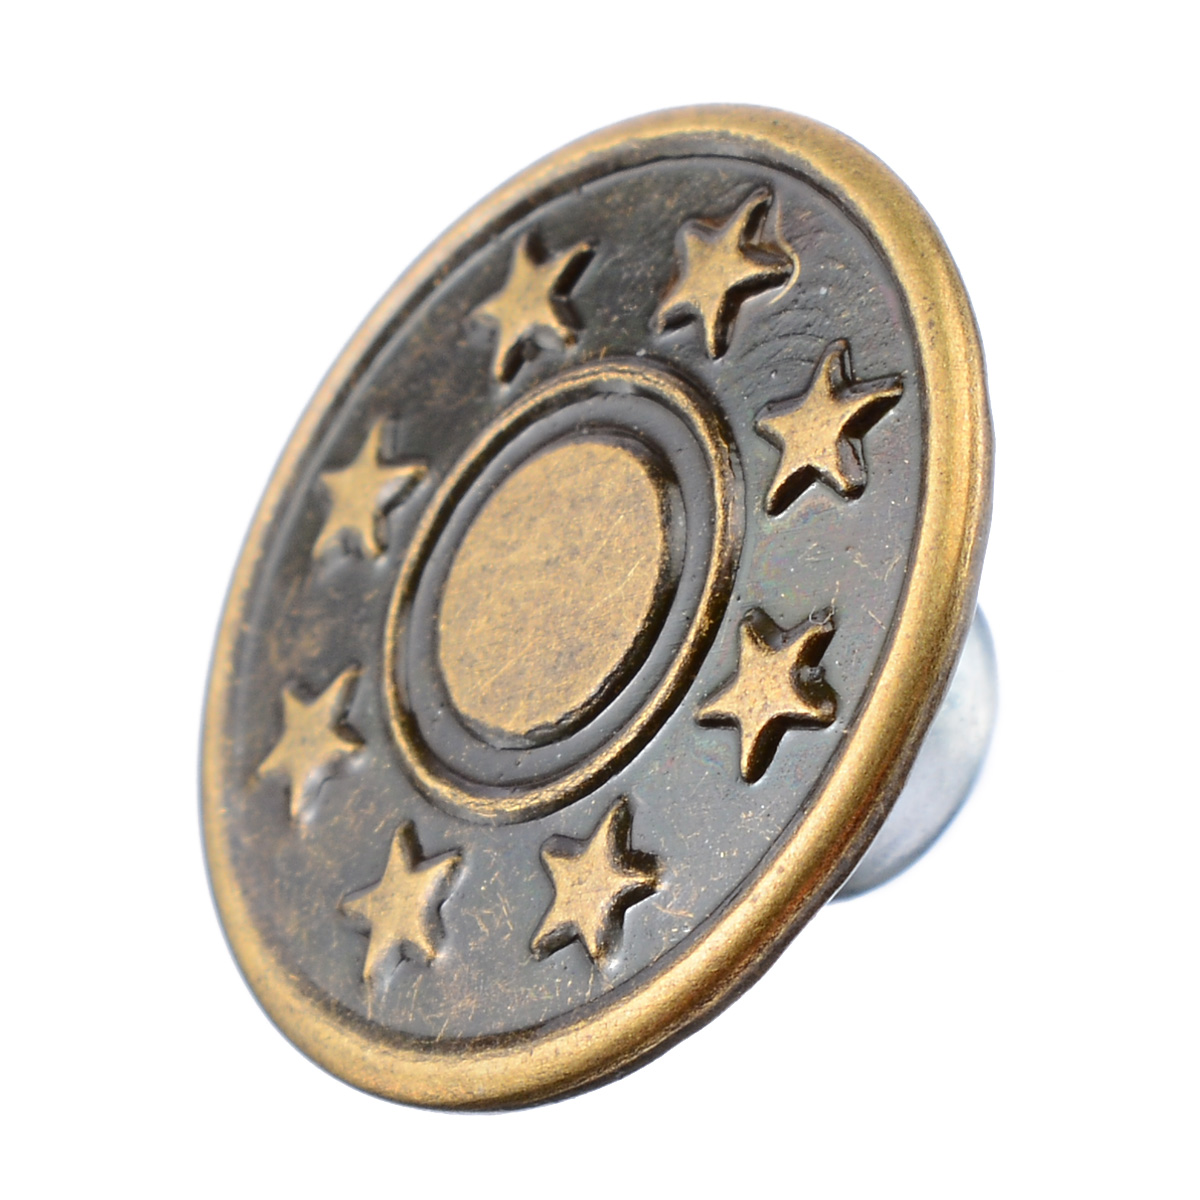 50 pcs/set Metal Button 5 Patterns Mix Denim Jacket Jeans Button 17mm Metal Hosier Button Seamless Press Button